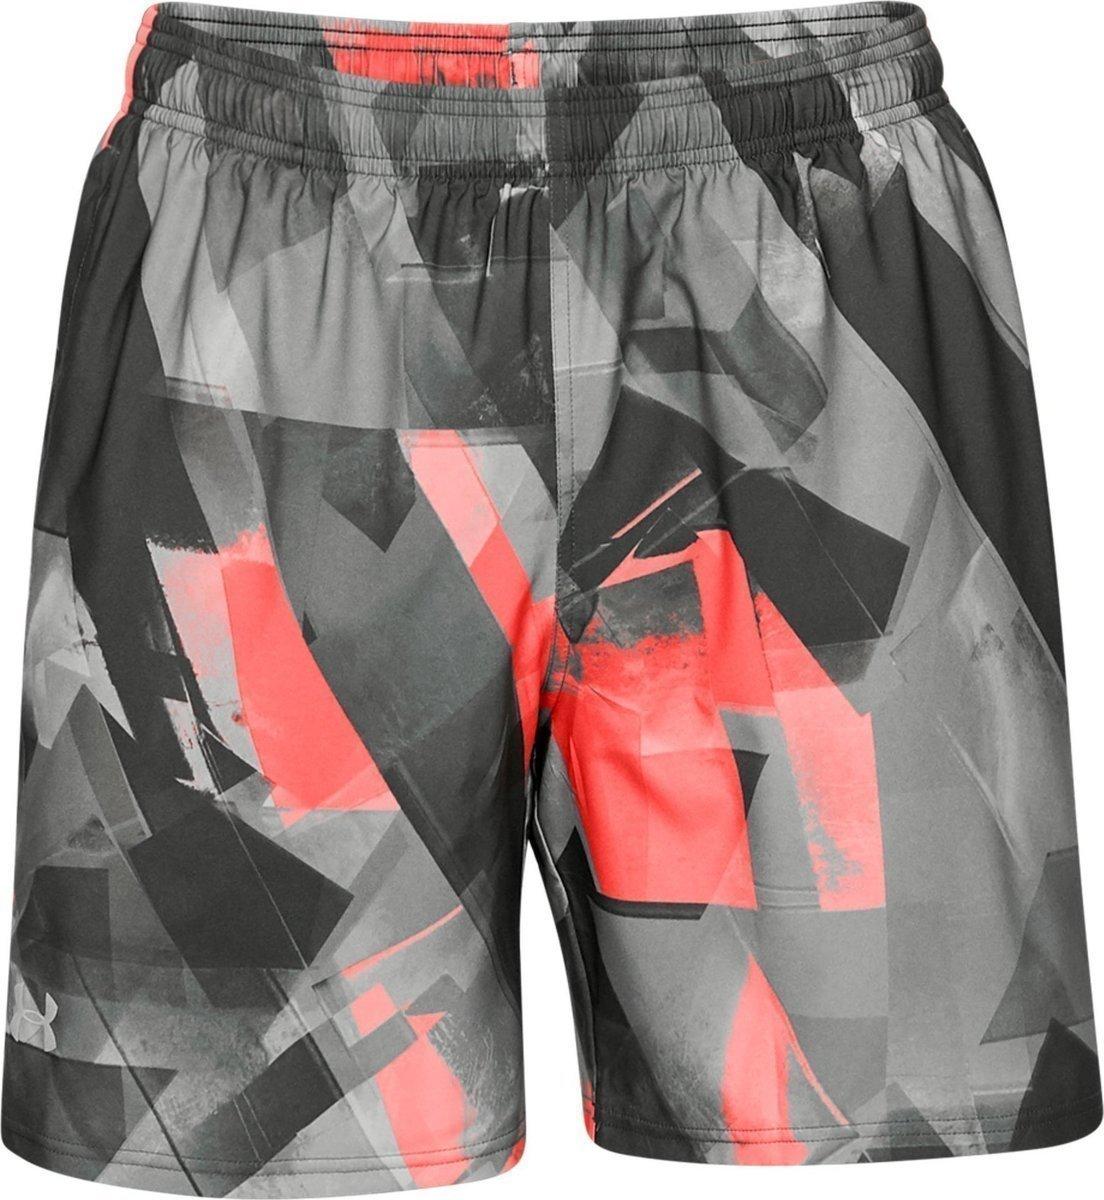 Pánské běžecká šortky Under Armour Launch SW 7